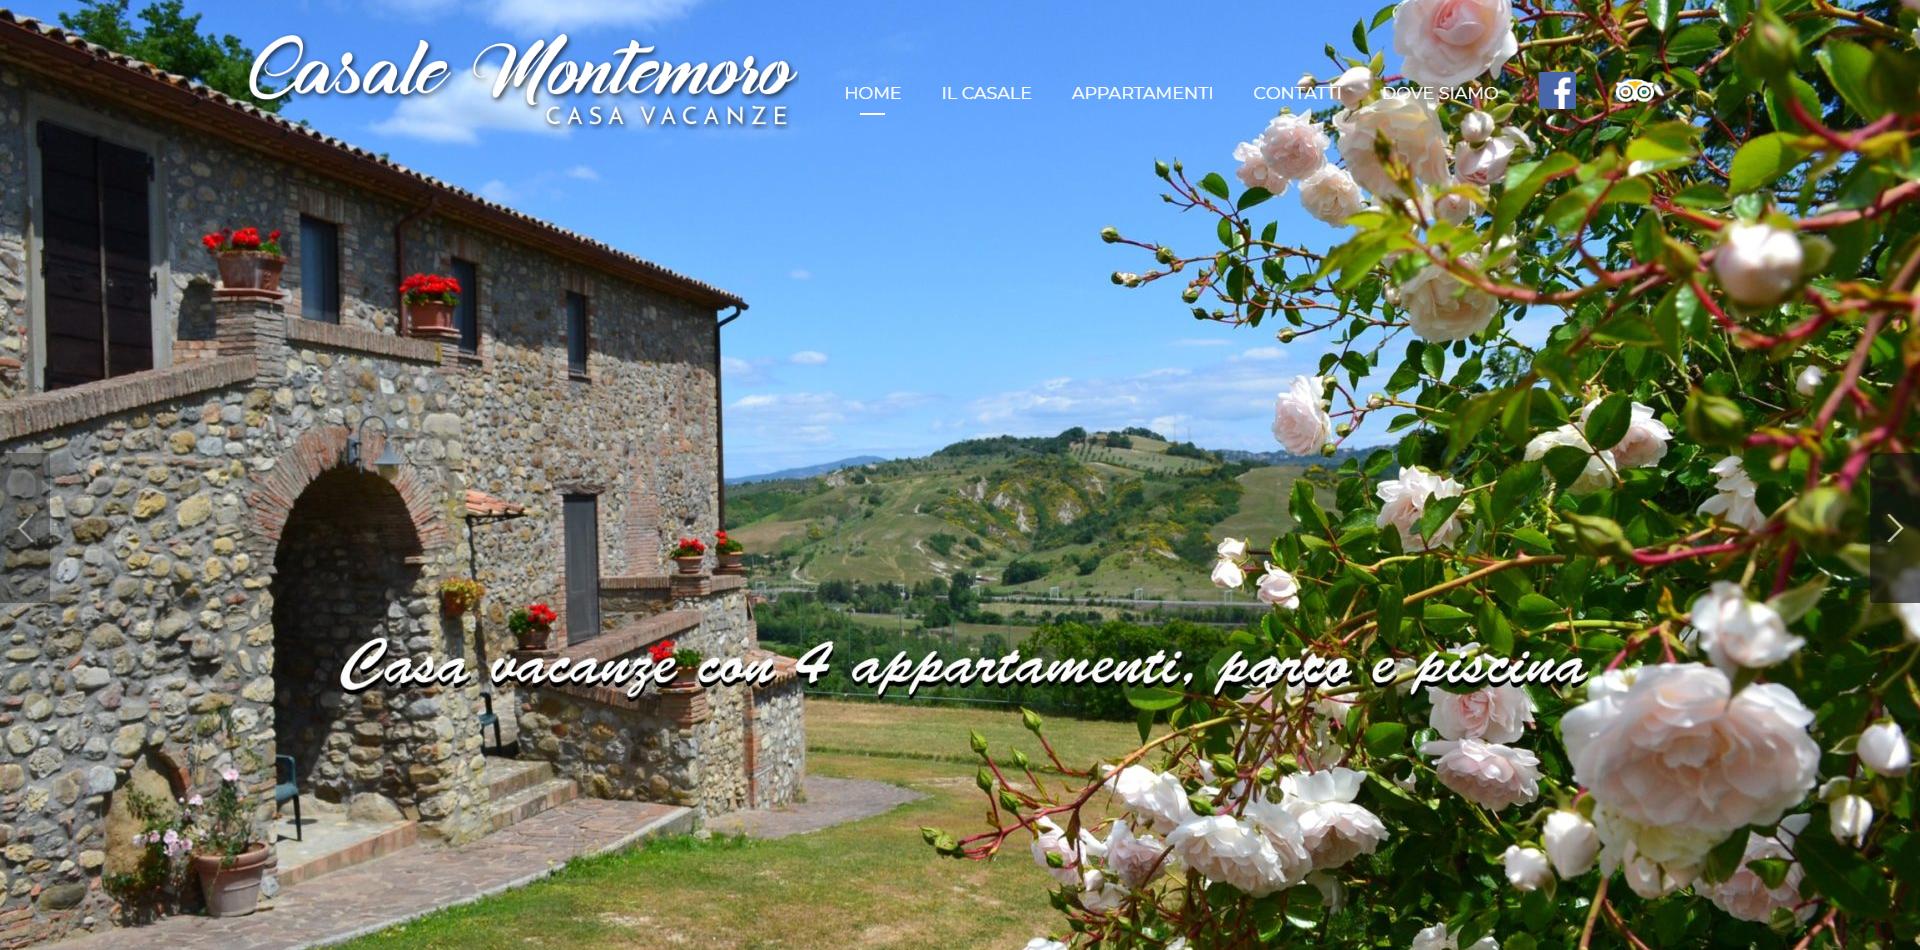 Casale Montemoro - Jeanzilla - Gianluca De Bianchi